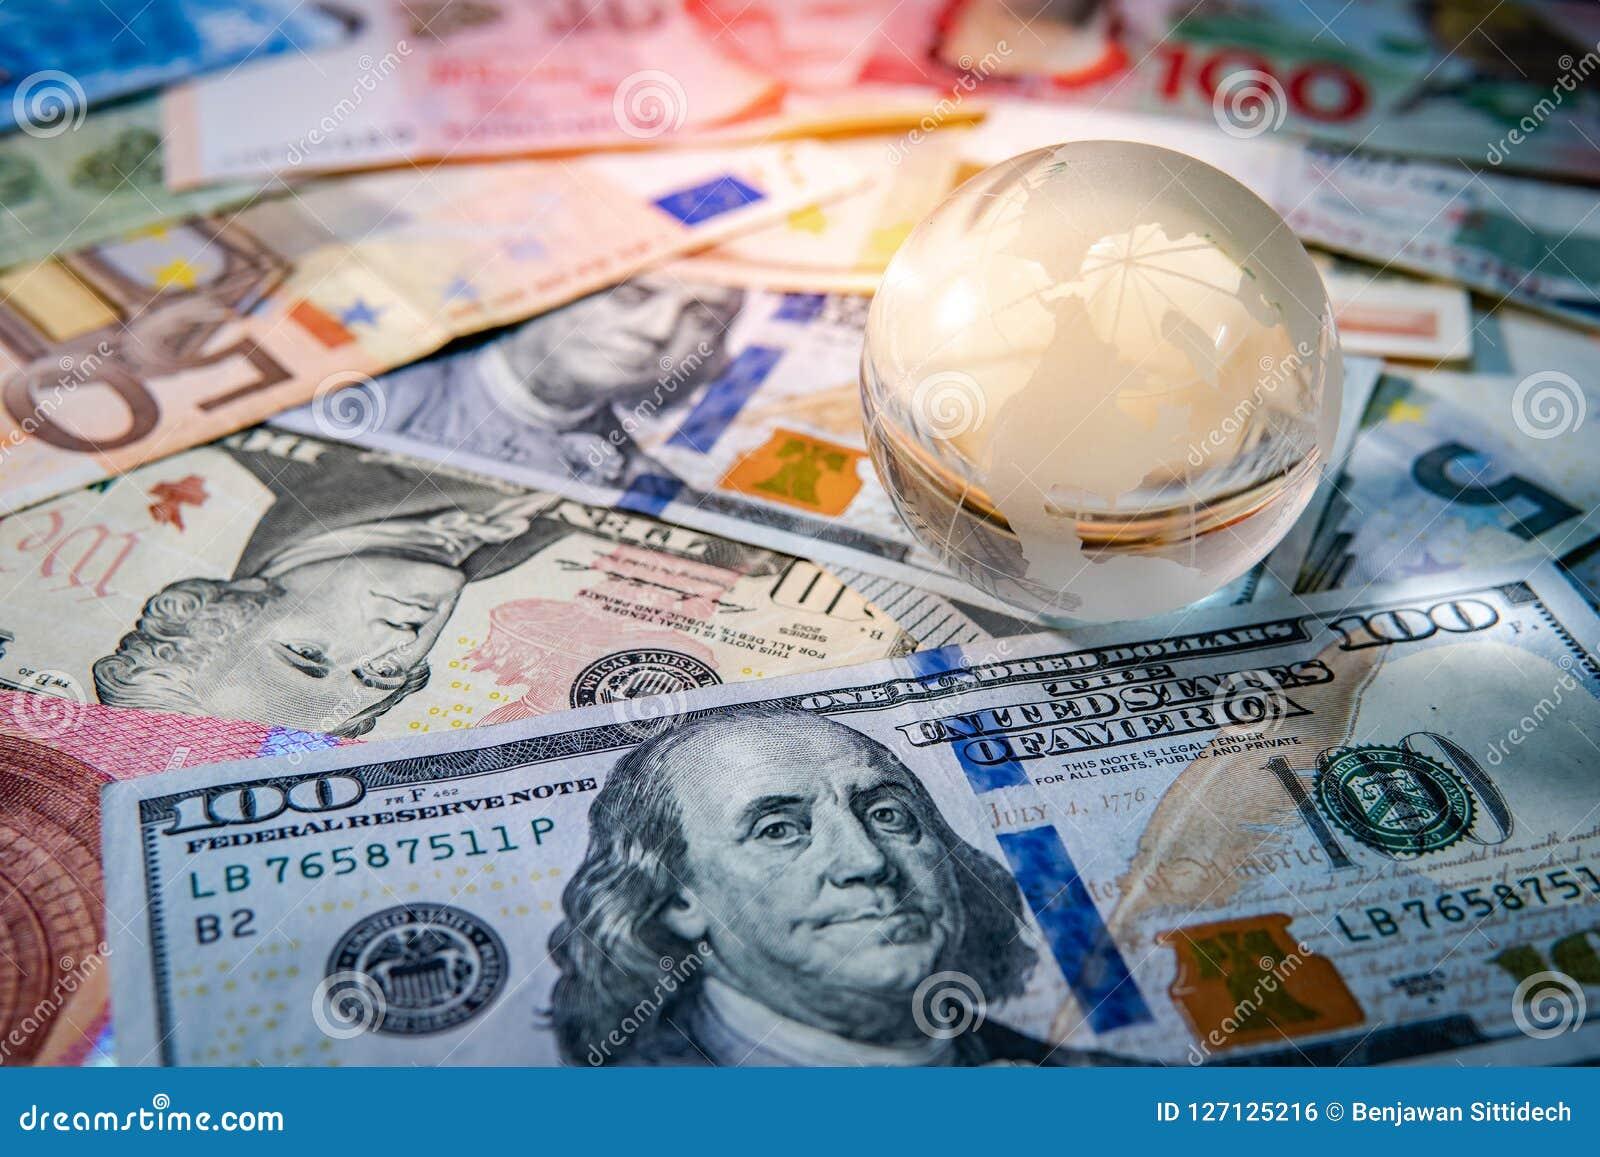 World globe crystal on various banknotes